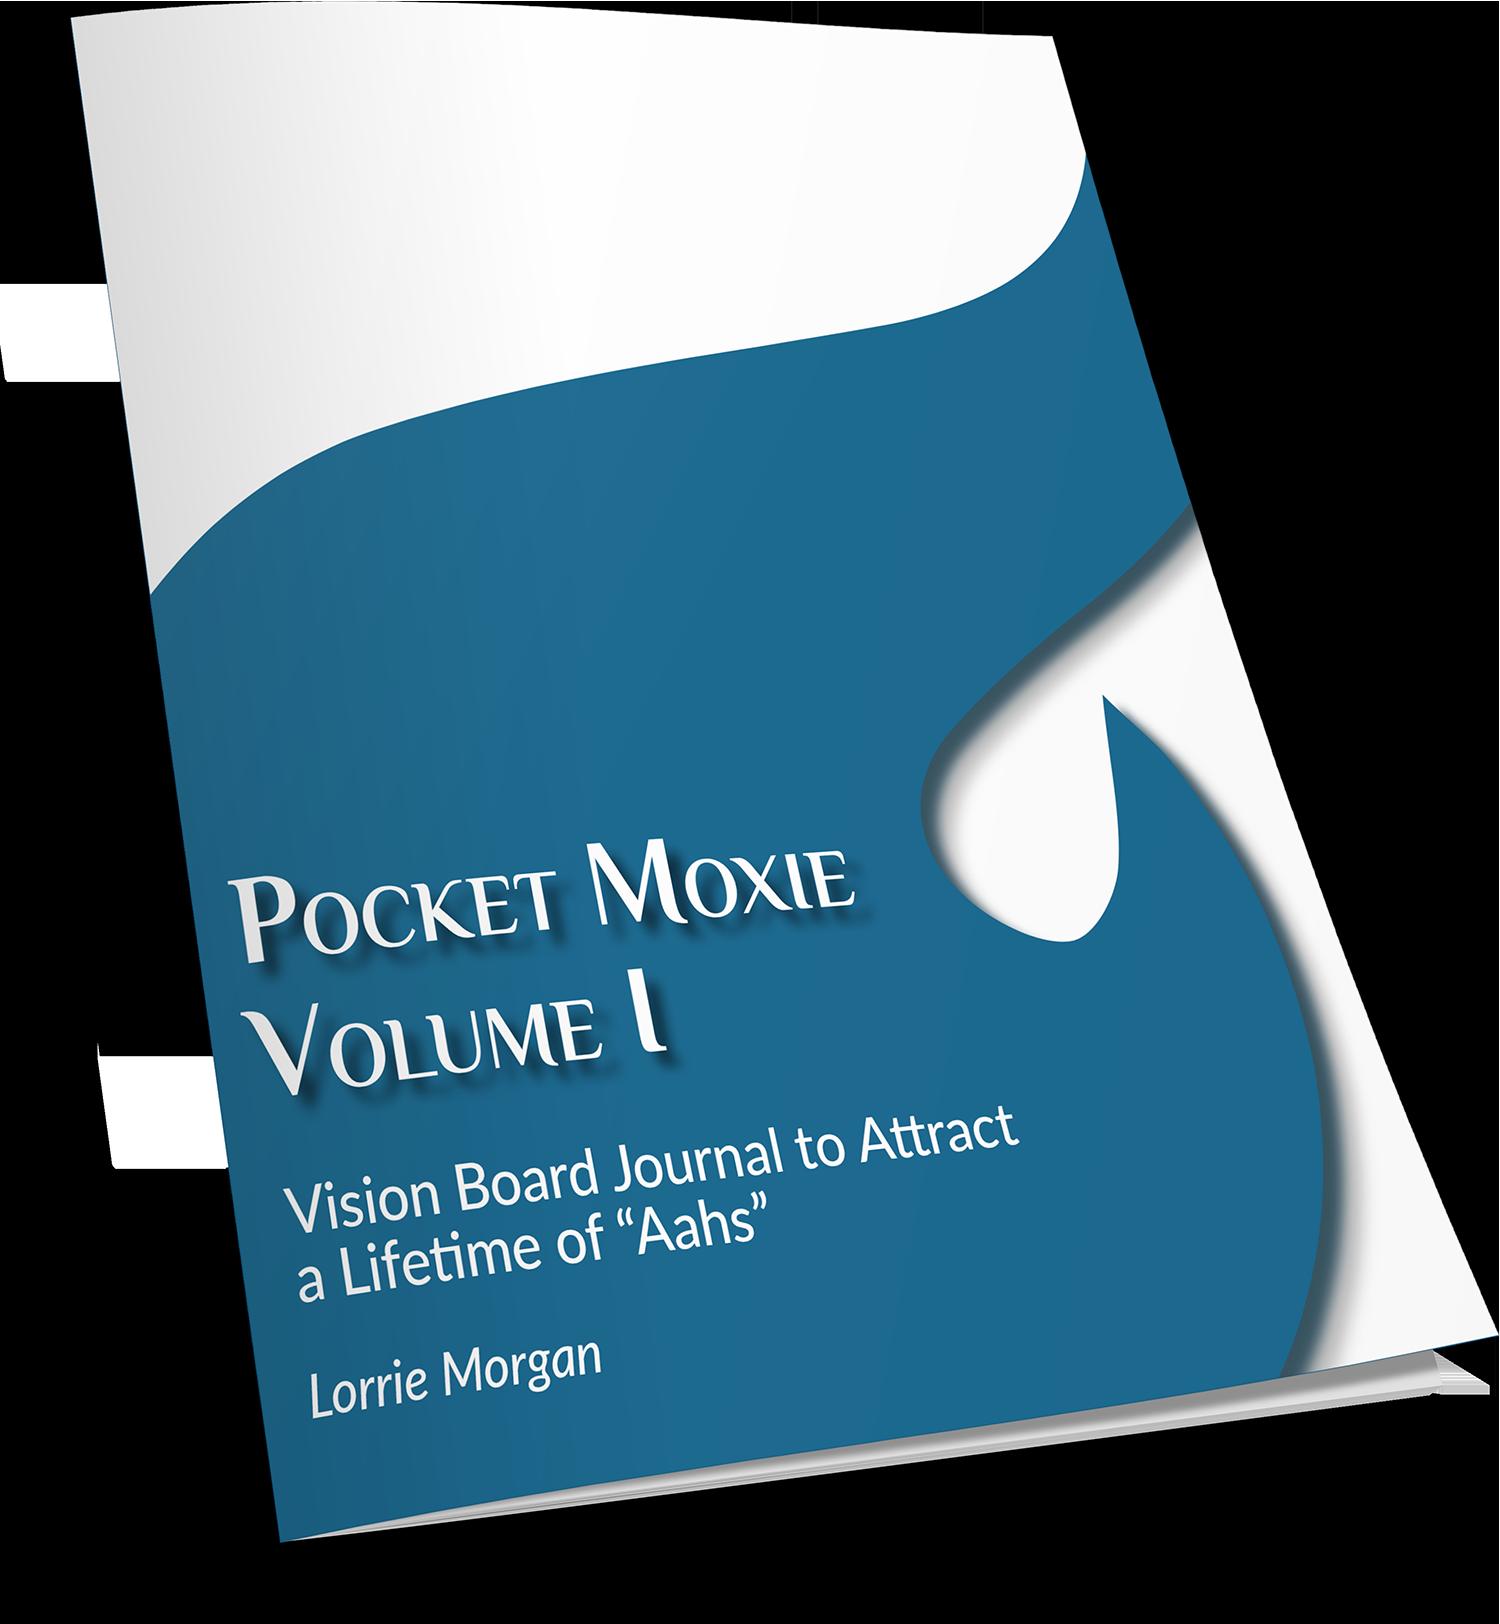 Pocket Moxie V1